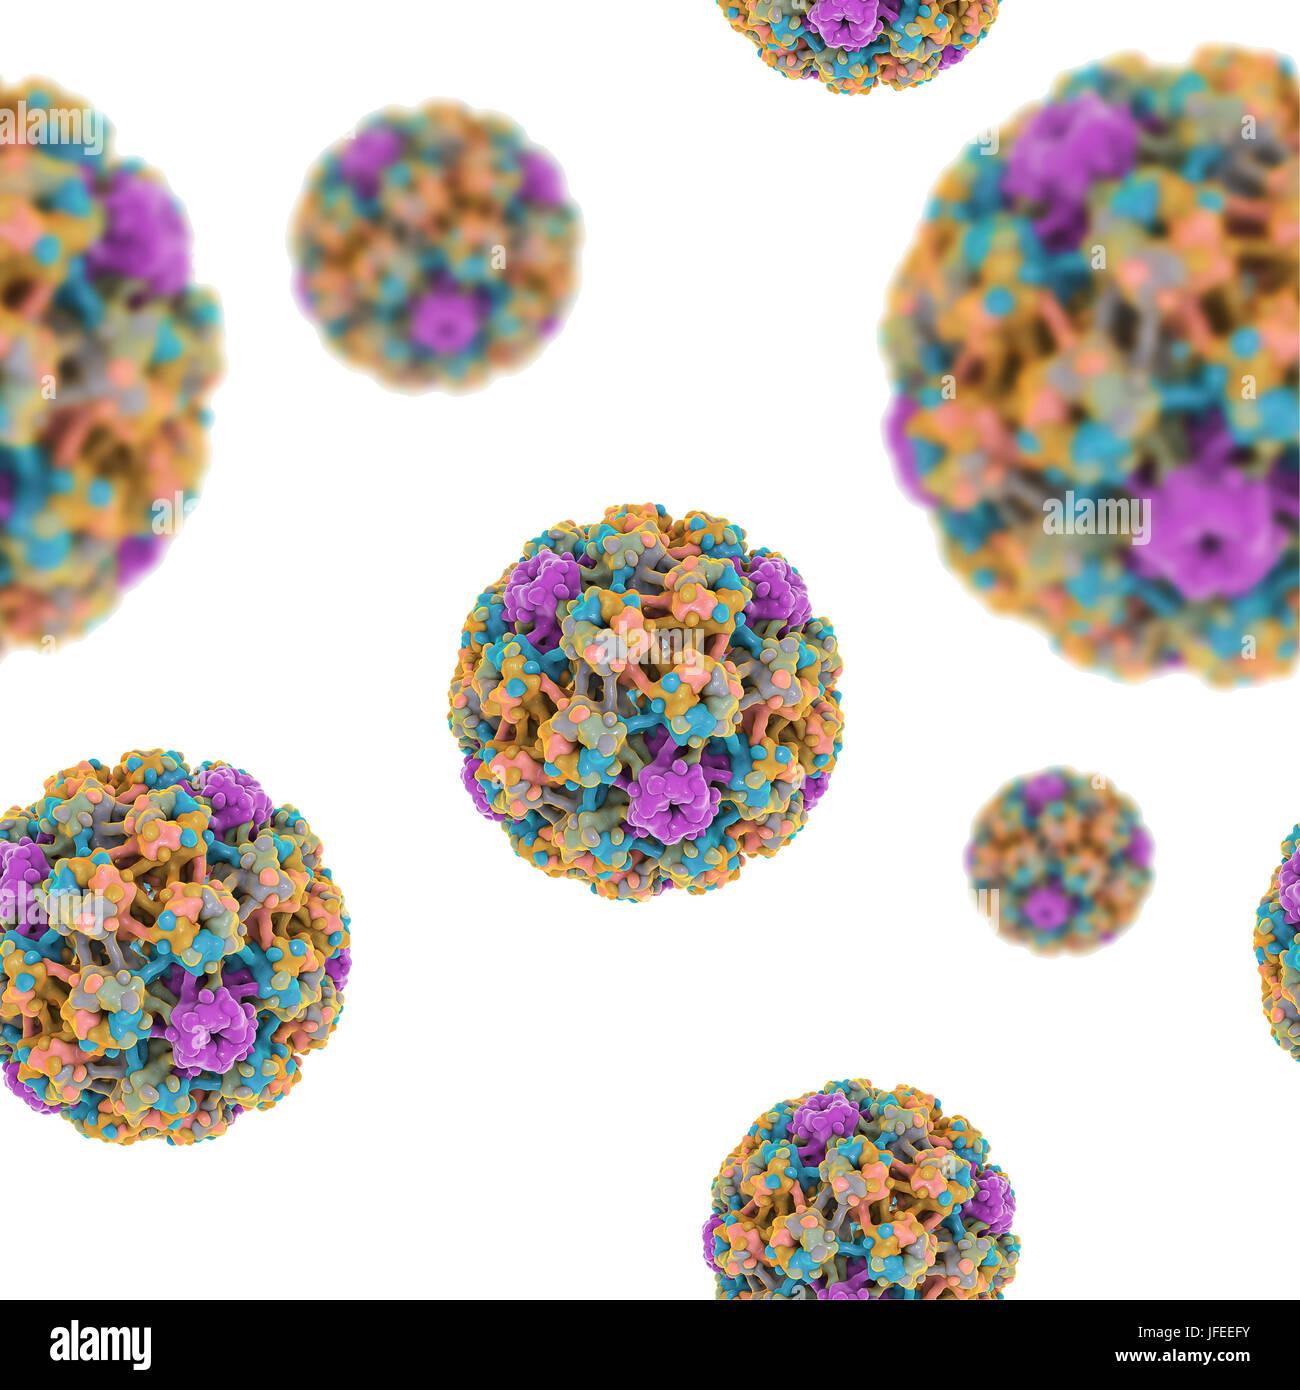 human papilloma virus stockfotos human papilloma virus. Black Bedroom Furniture Sets. Home Design Ideas